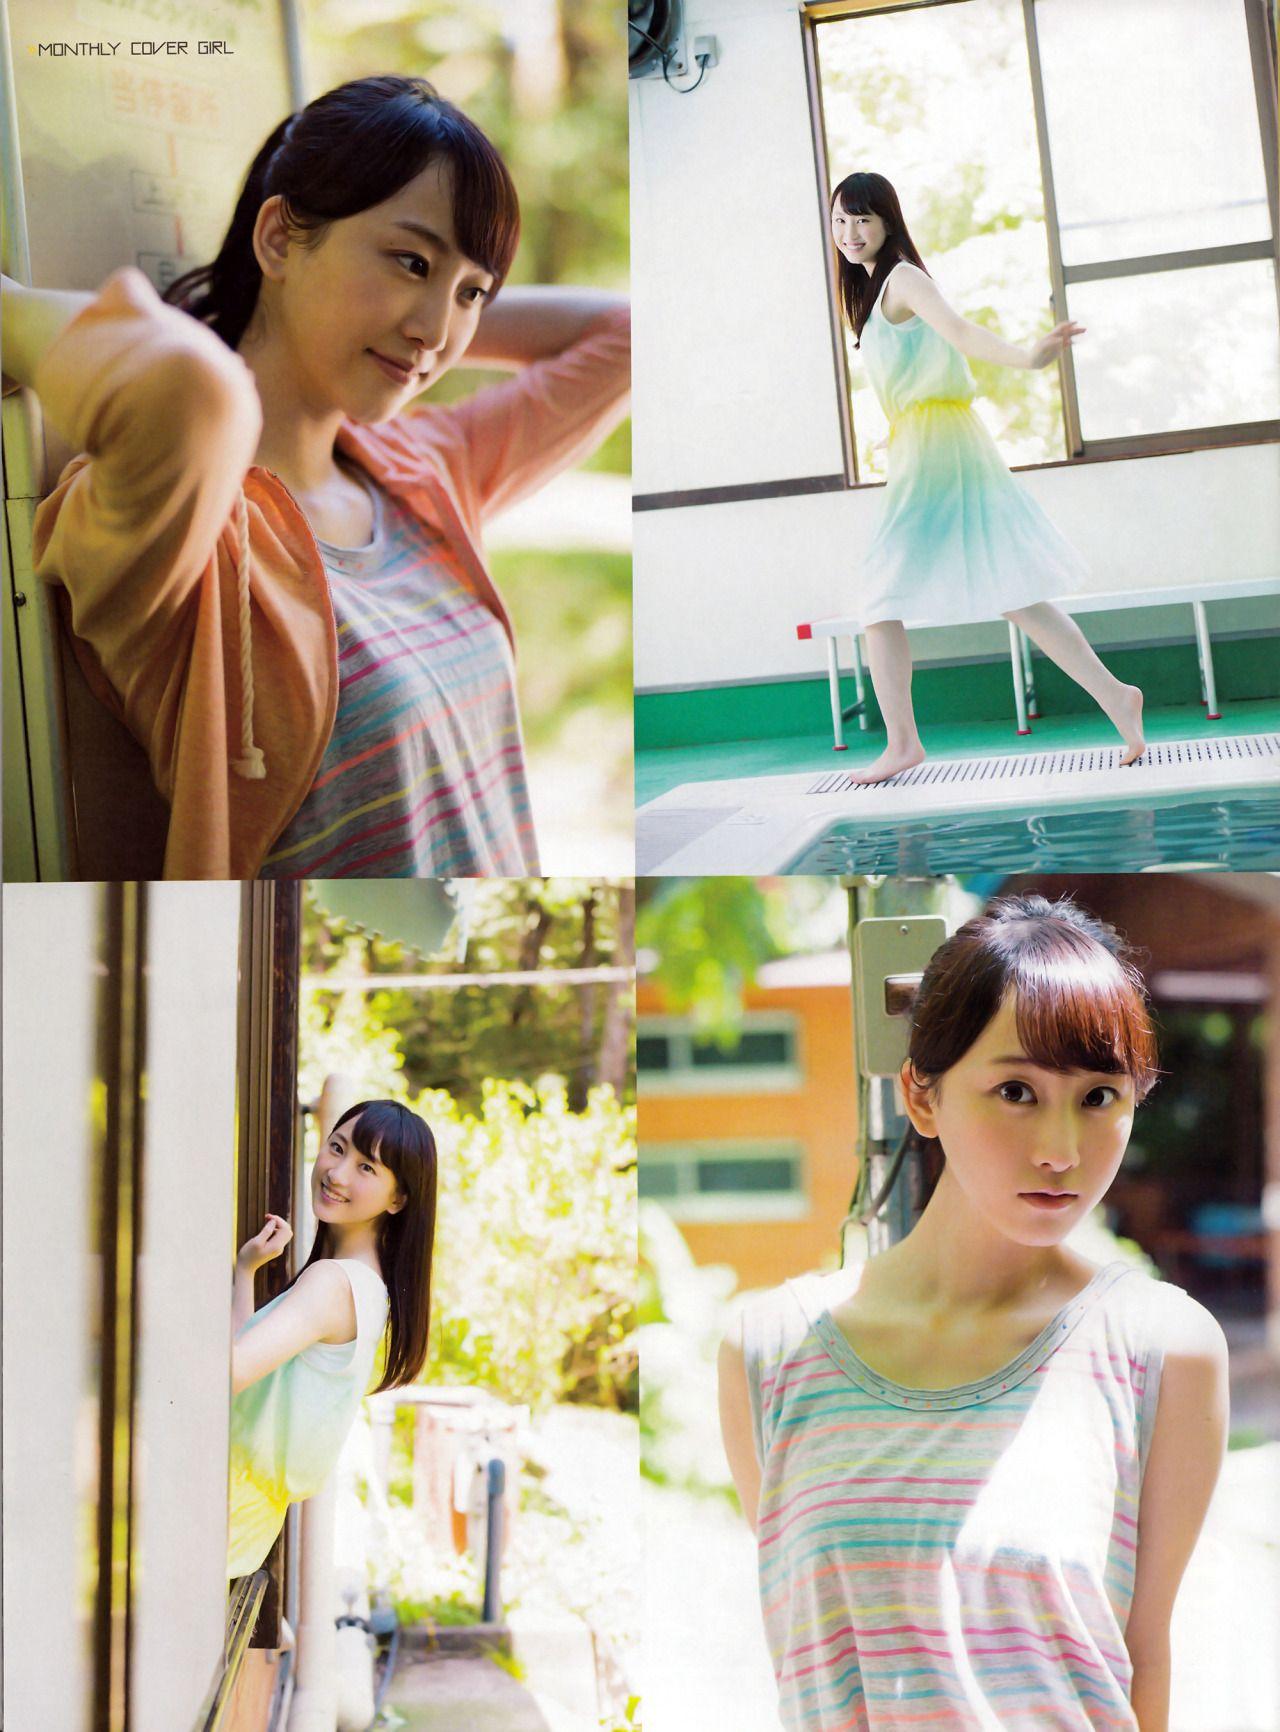 Matsui Rena (松井玲奈) - #SKE48 #TeamE / #NGZK46 - #Nogizaka46 #senbatsu #japan #idol #jpop #gravure